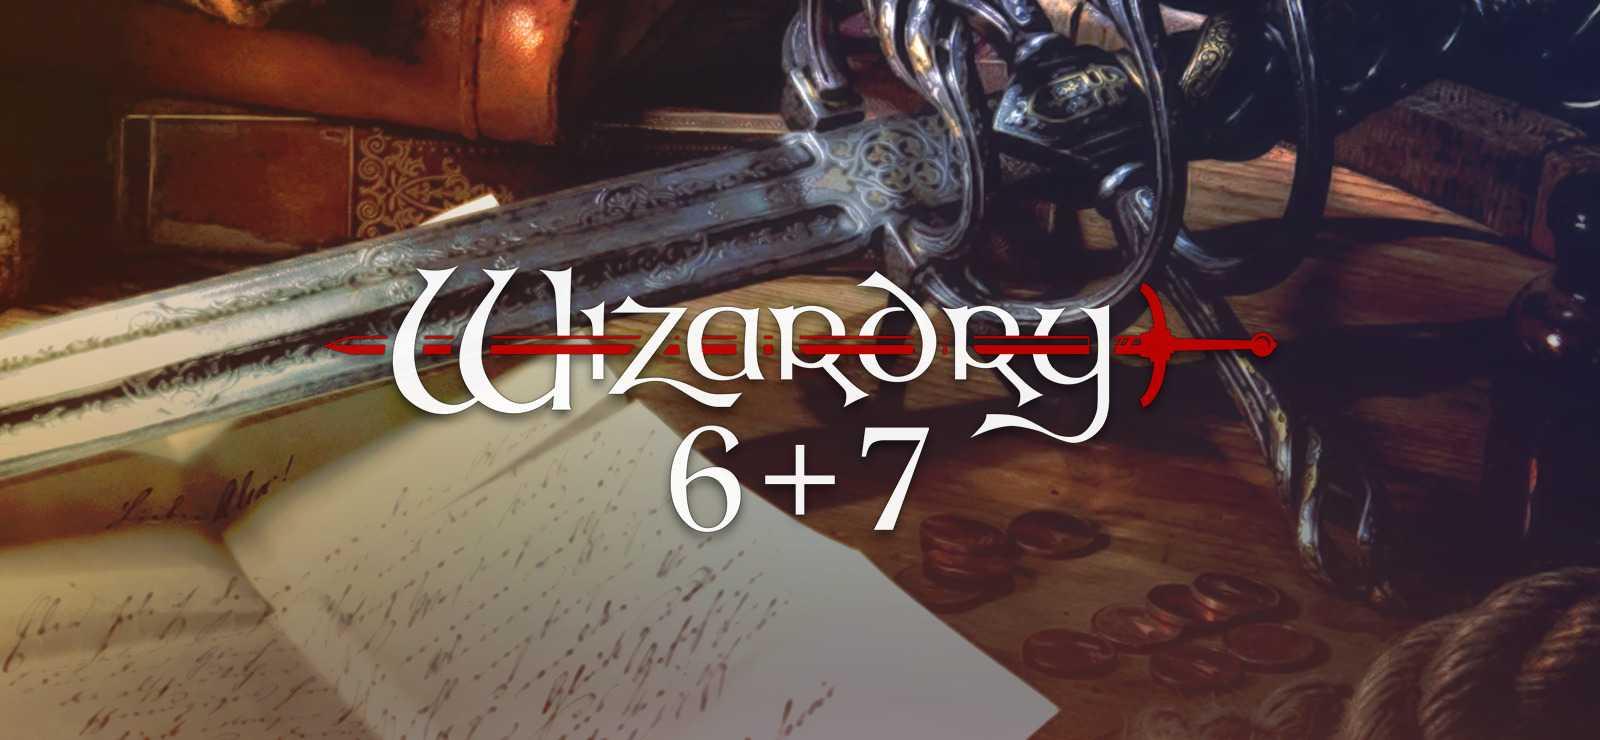 Wizardry 6+7